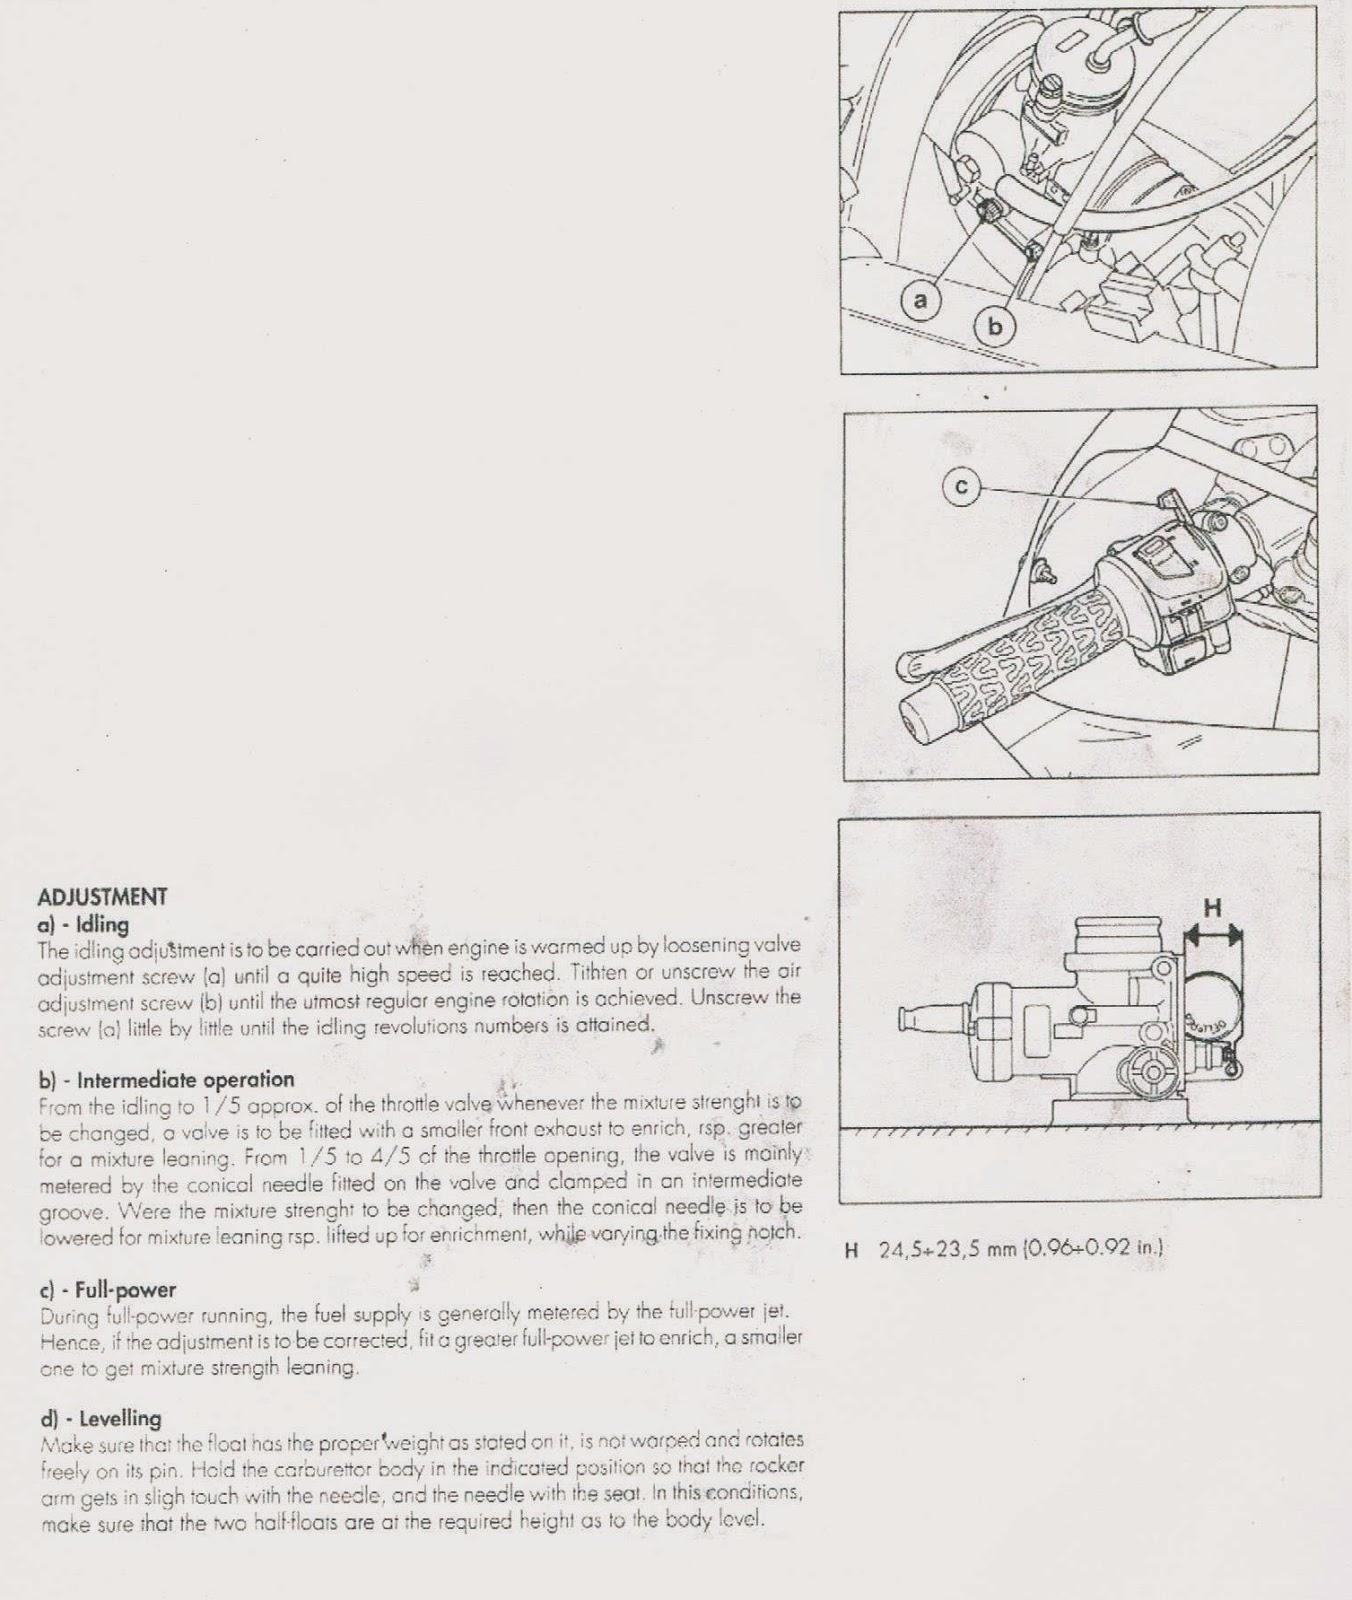 2007 bmw k1200lt wiring diagram